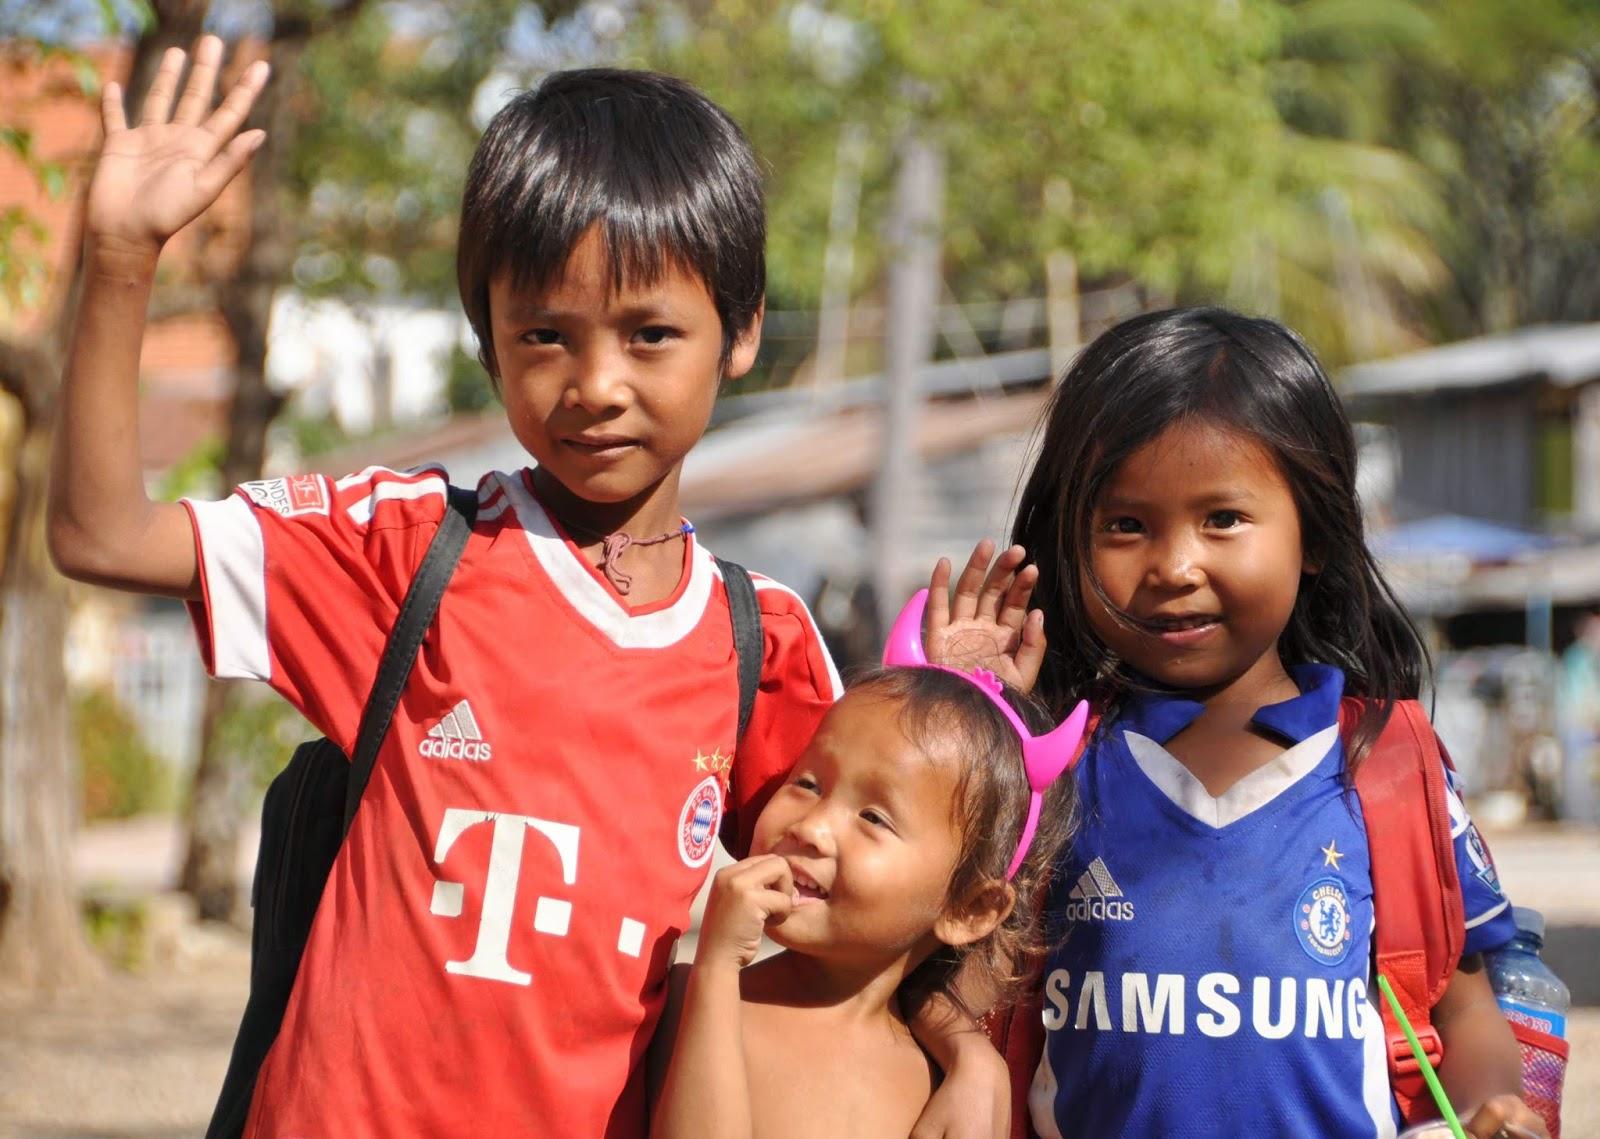 Viiith rencontres du vietnam